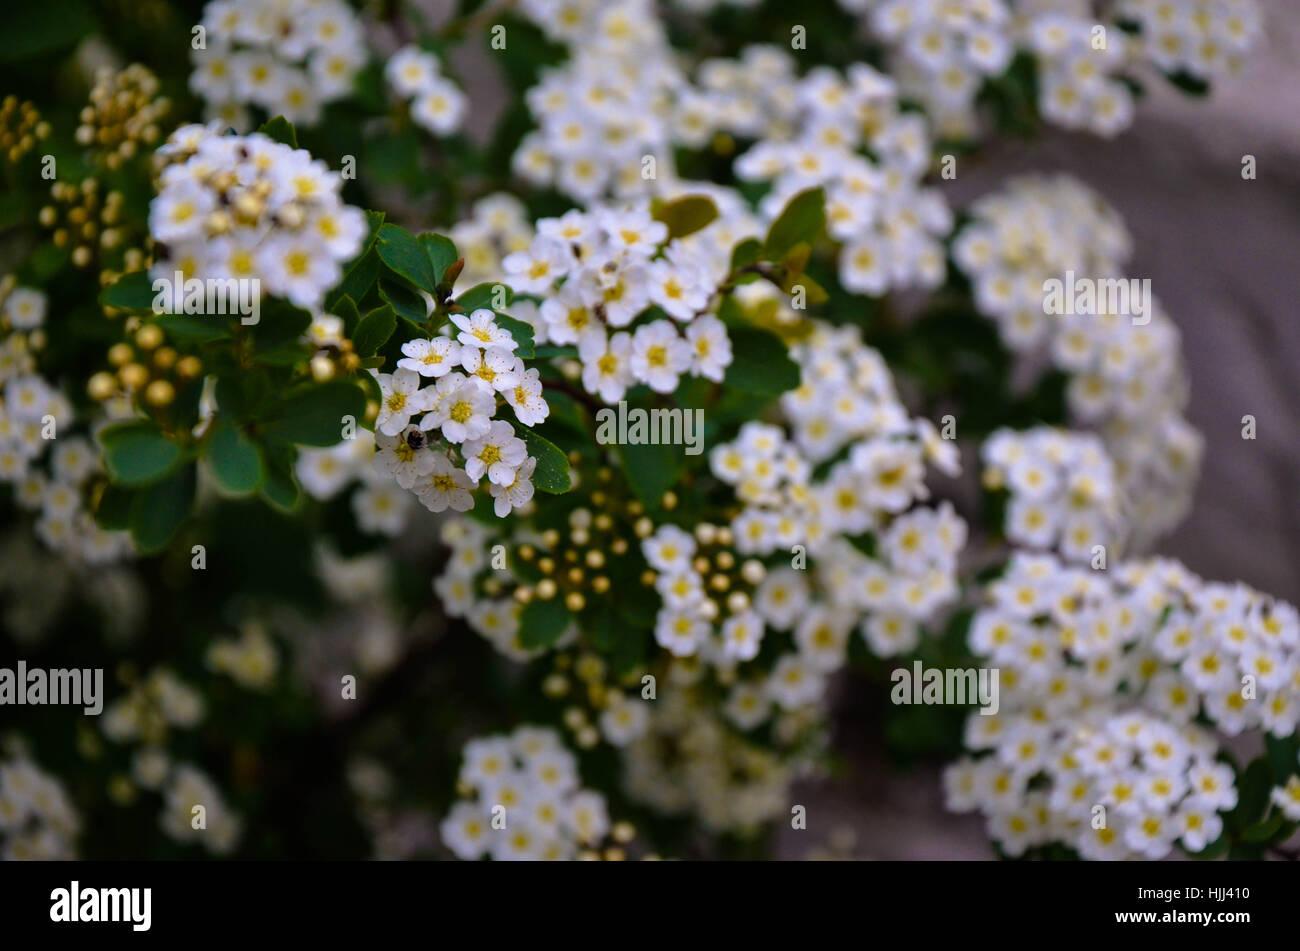 Spirea Flowers Stock Photos Spirea Flowers Stock Images Alamy